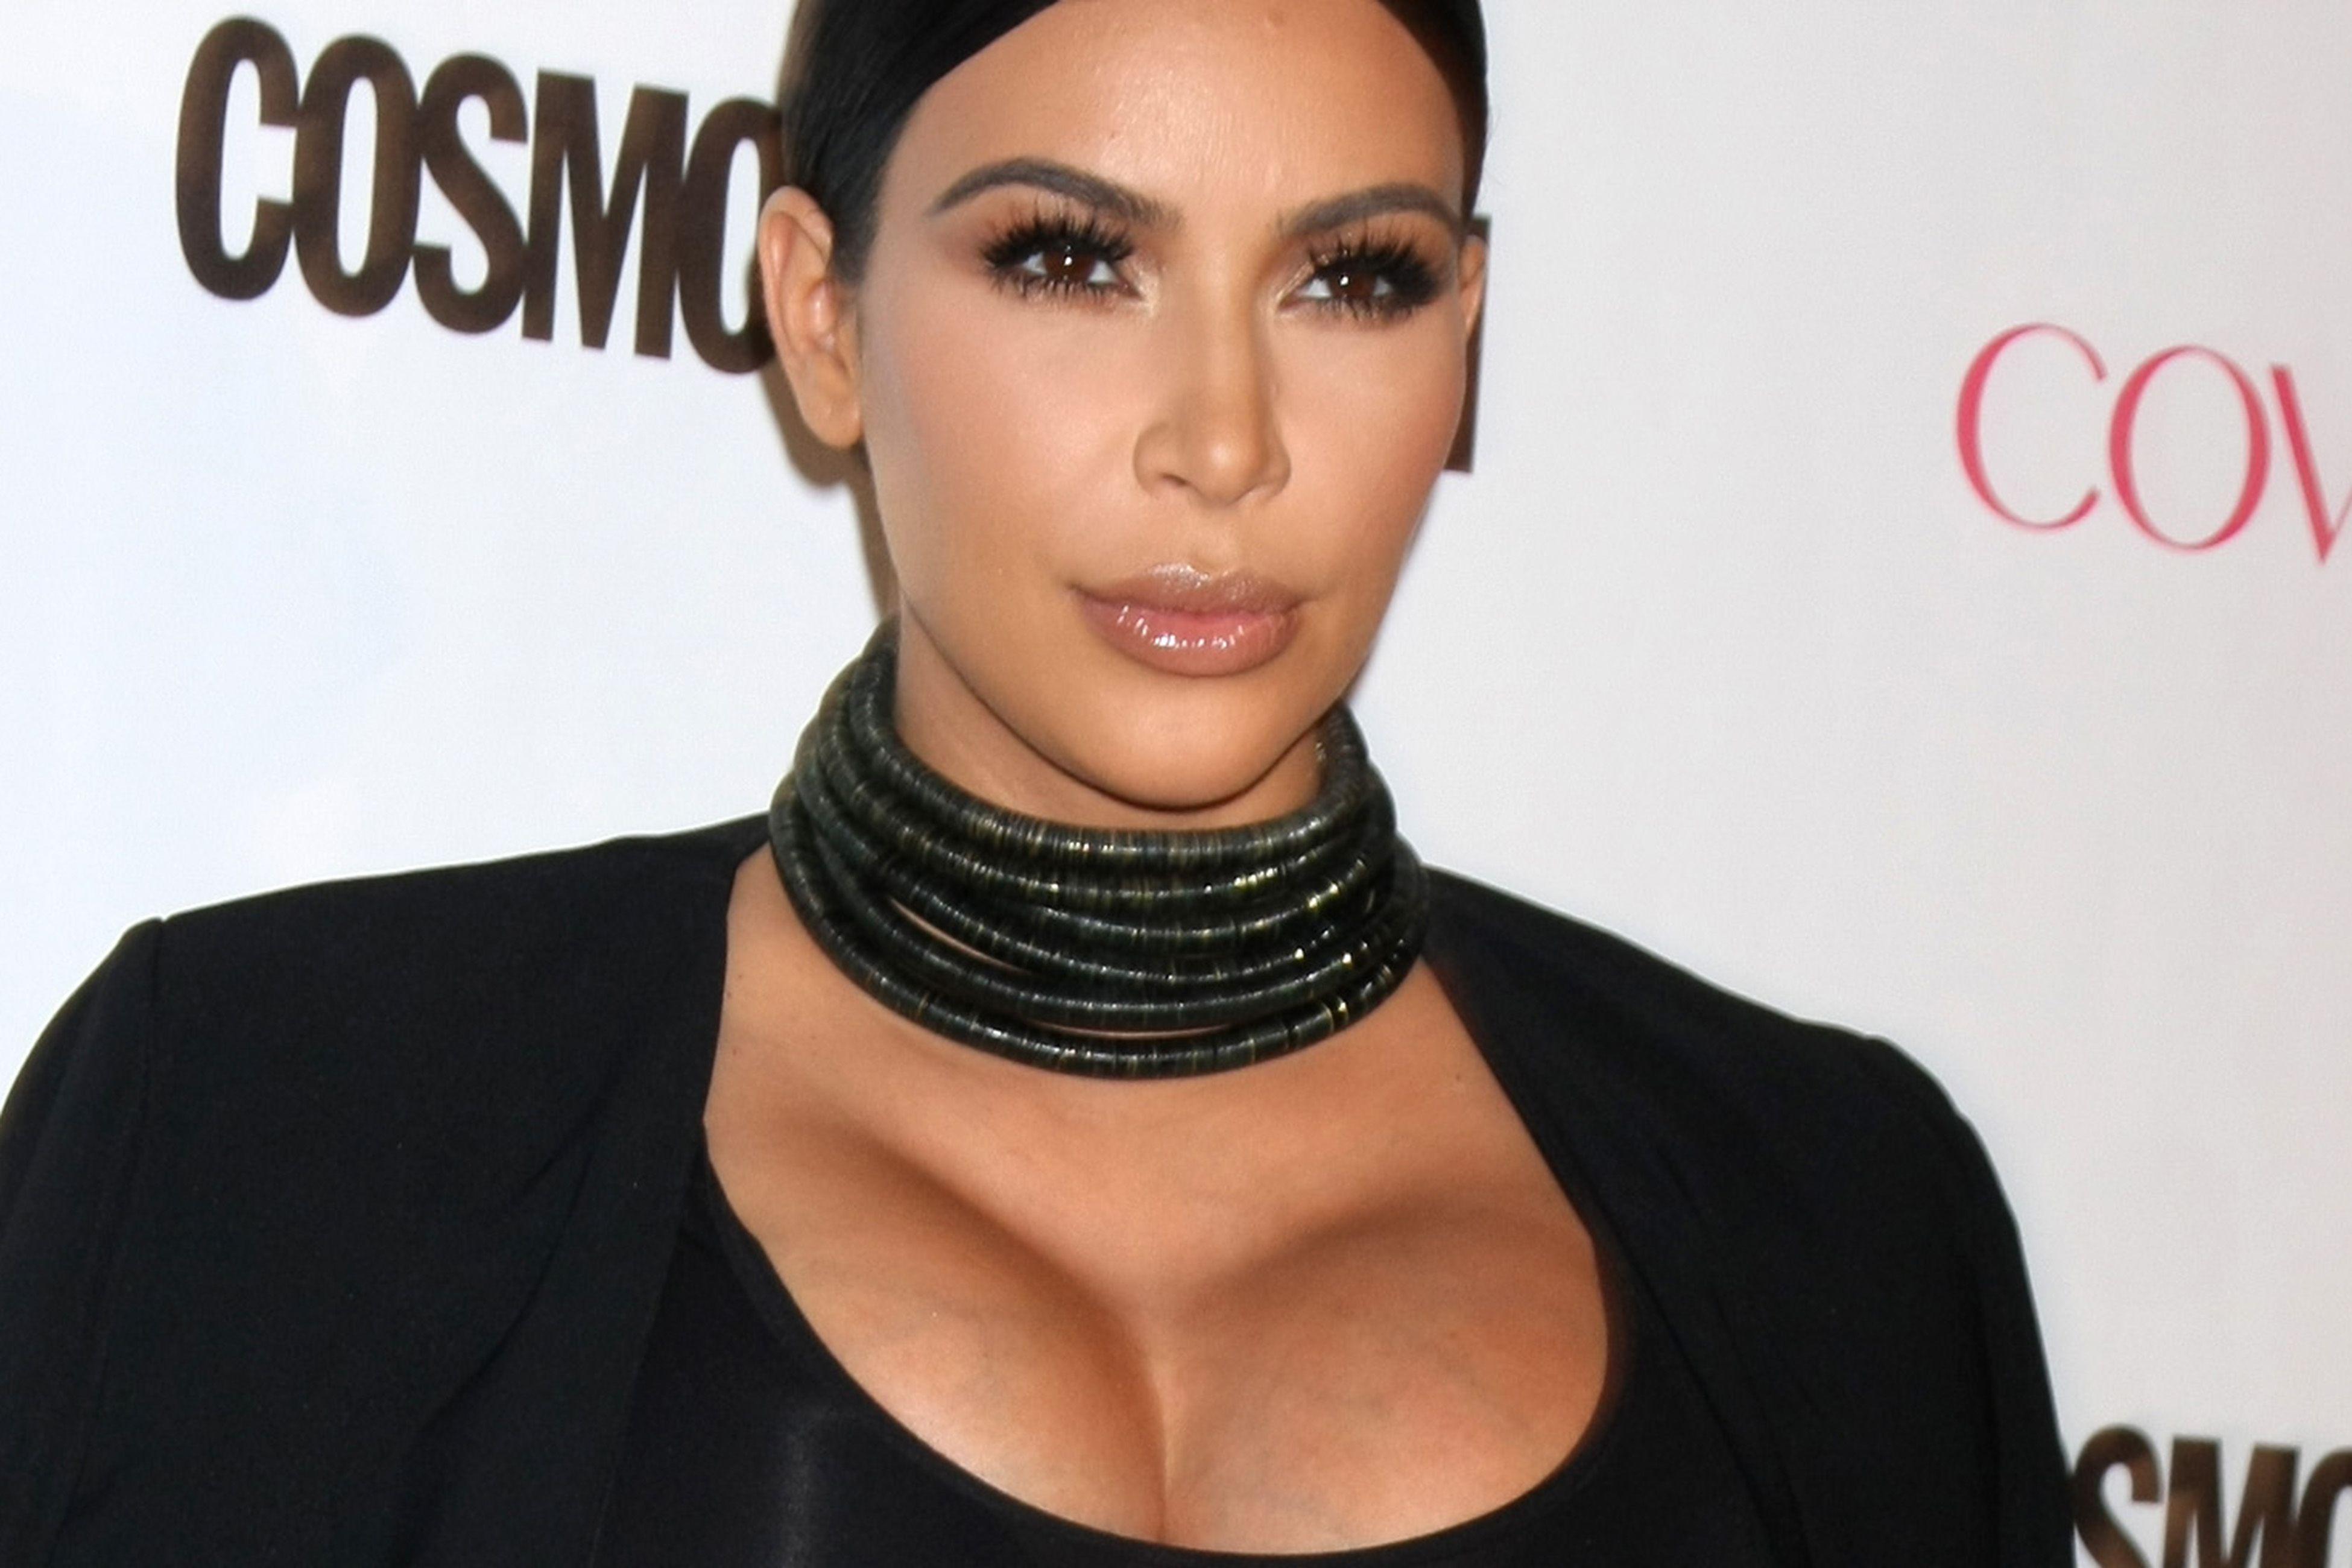 Is Kim Kardashian a Good Mom?